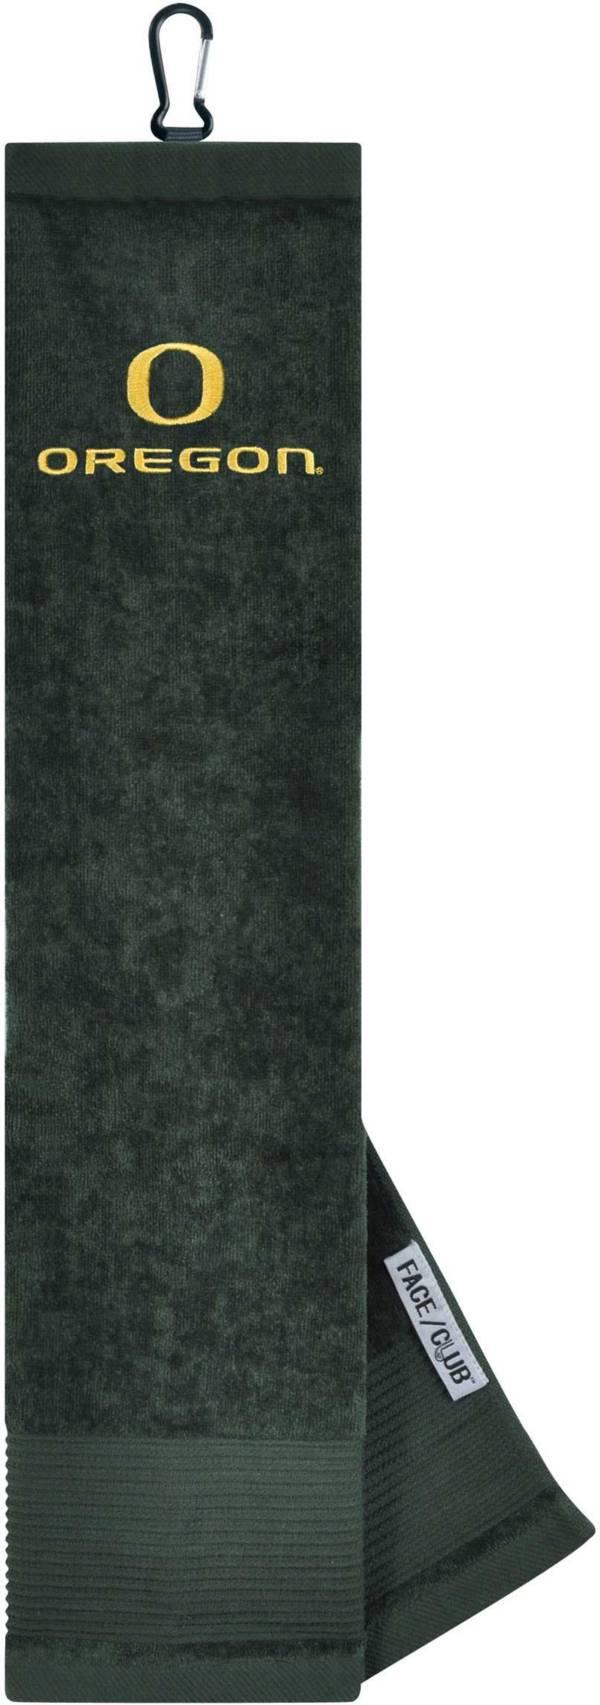 Team Effort Oregon Ducks Embroidered Face/Club Tri-Fold Towel product image